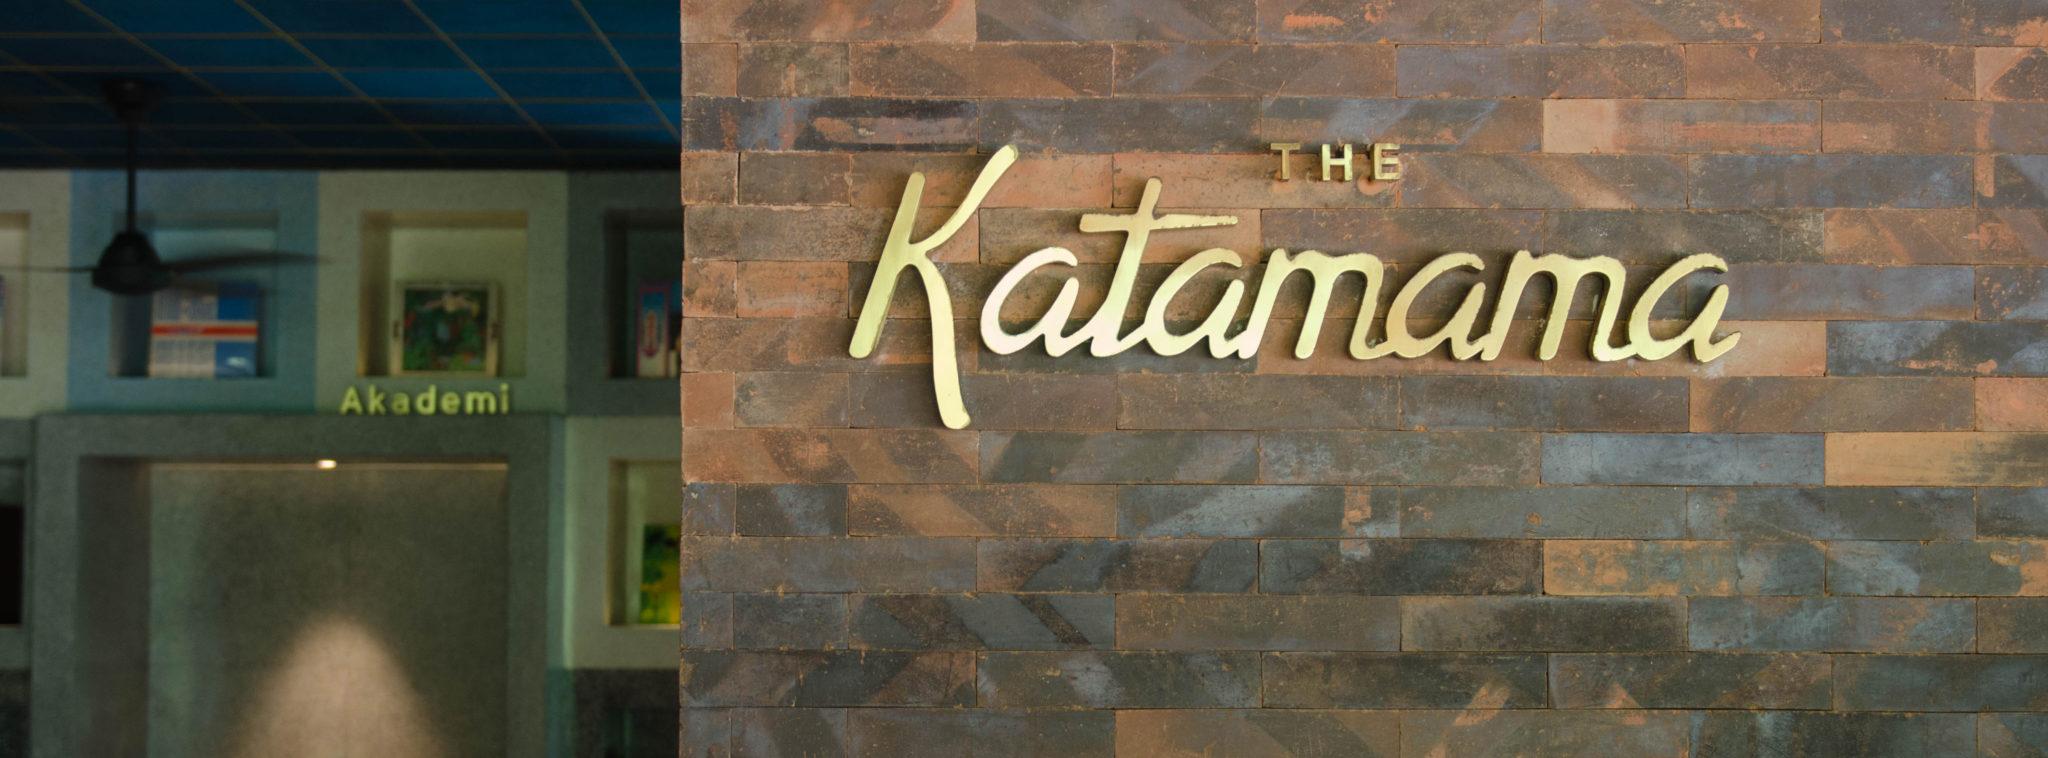 Katamama-Hotel-Bali-Eingang-Backstein-Slider